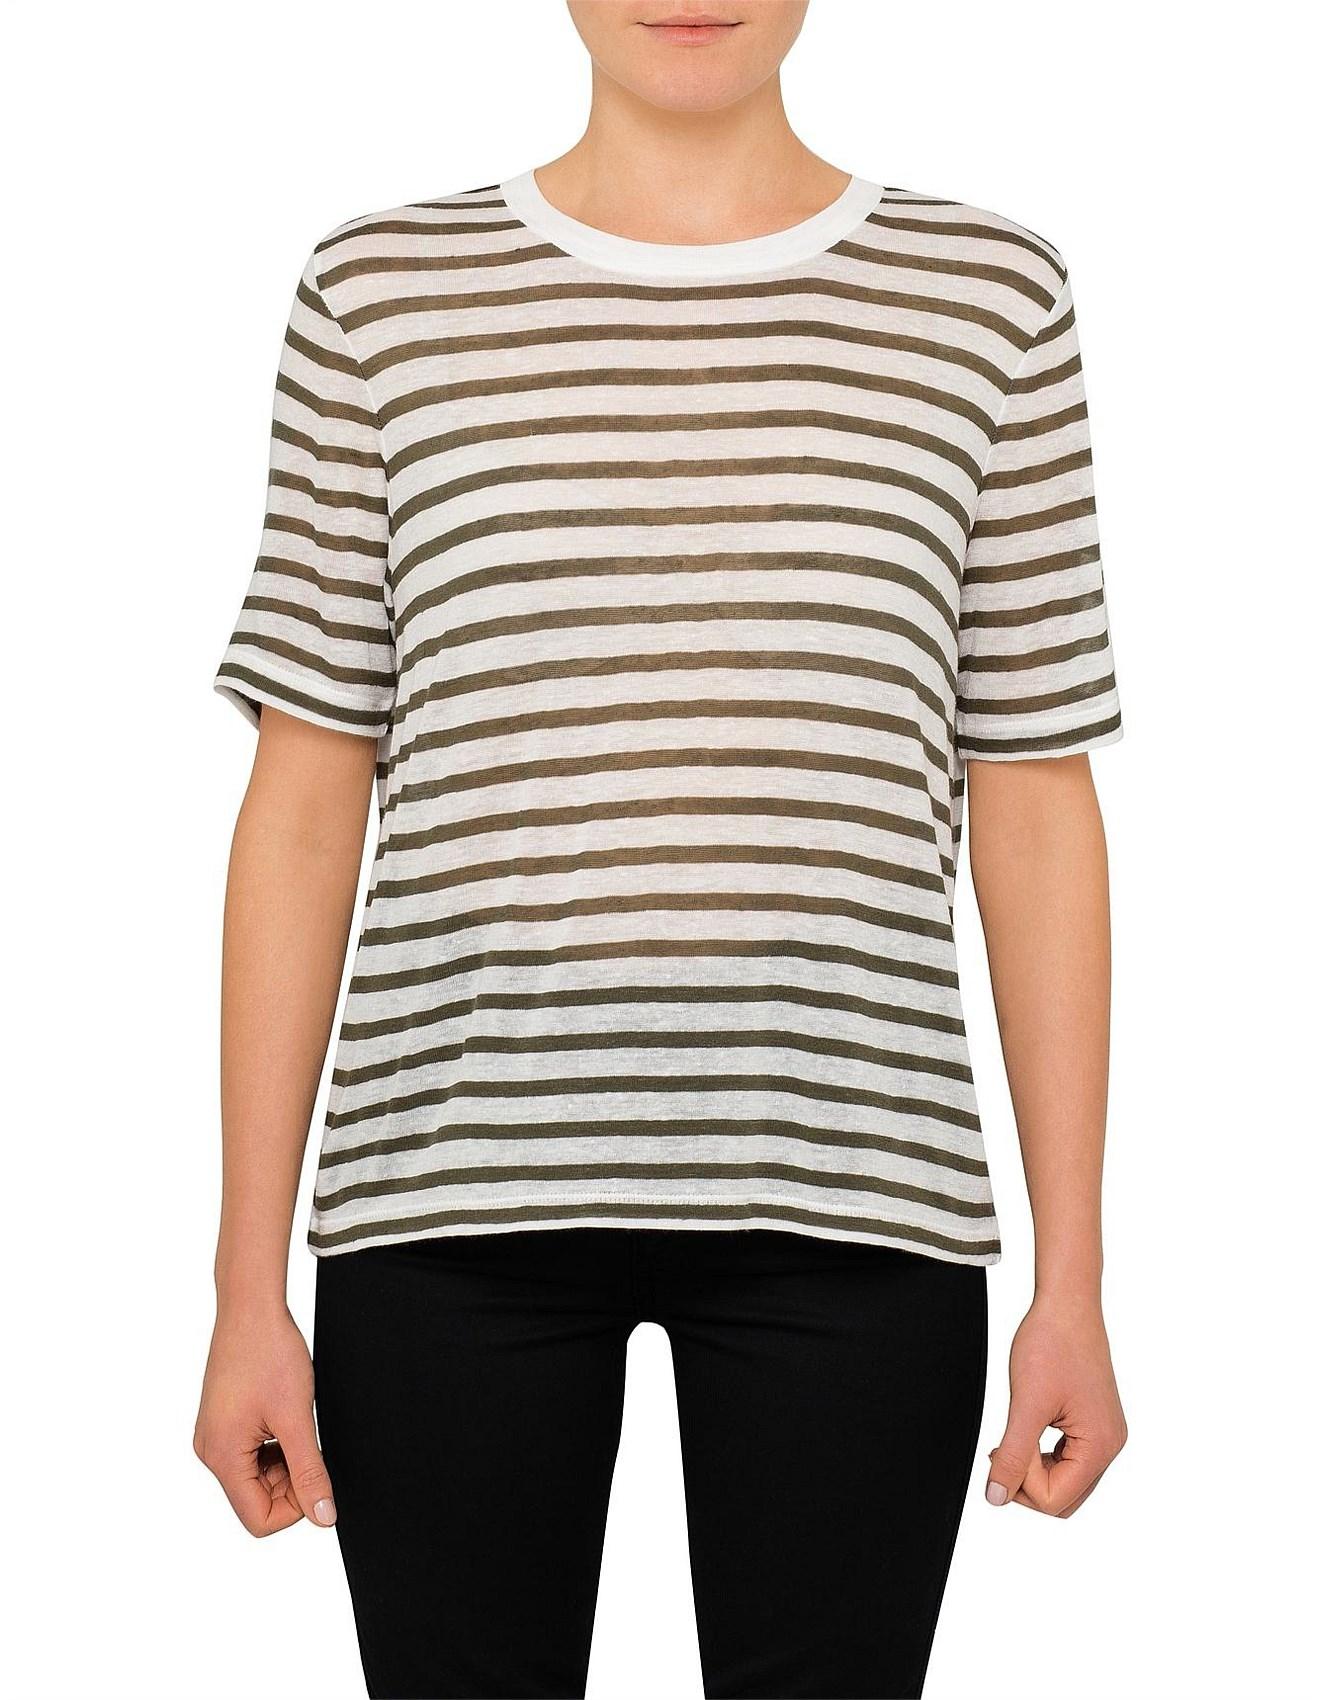 eb4fc5cd Tops, Tees & T-Shirts - Striped Slub Jersey Tee